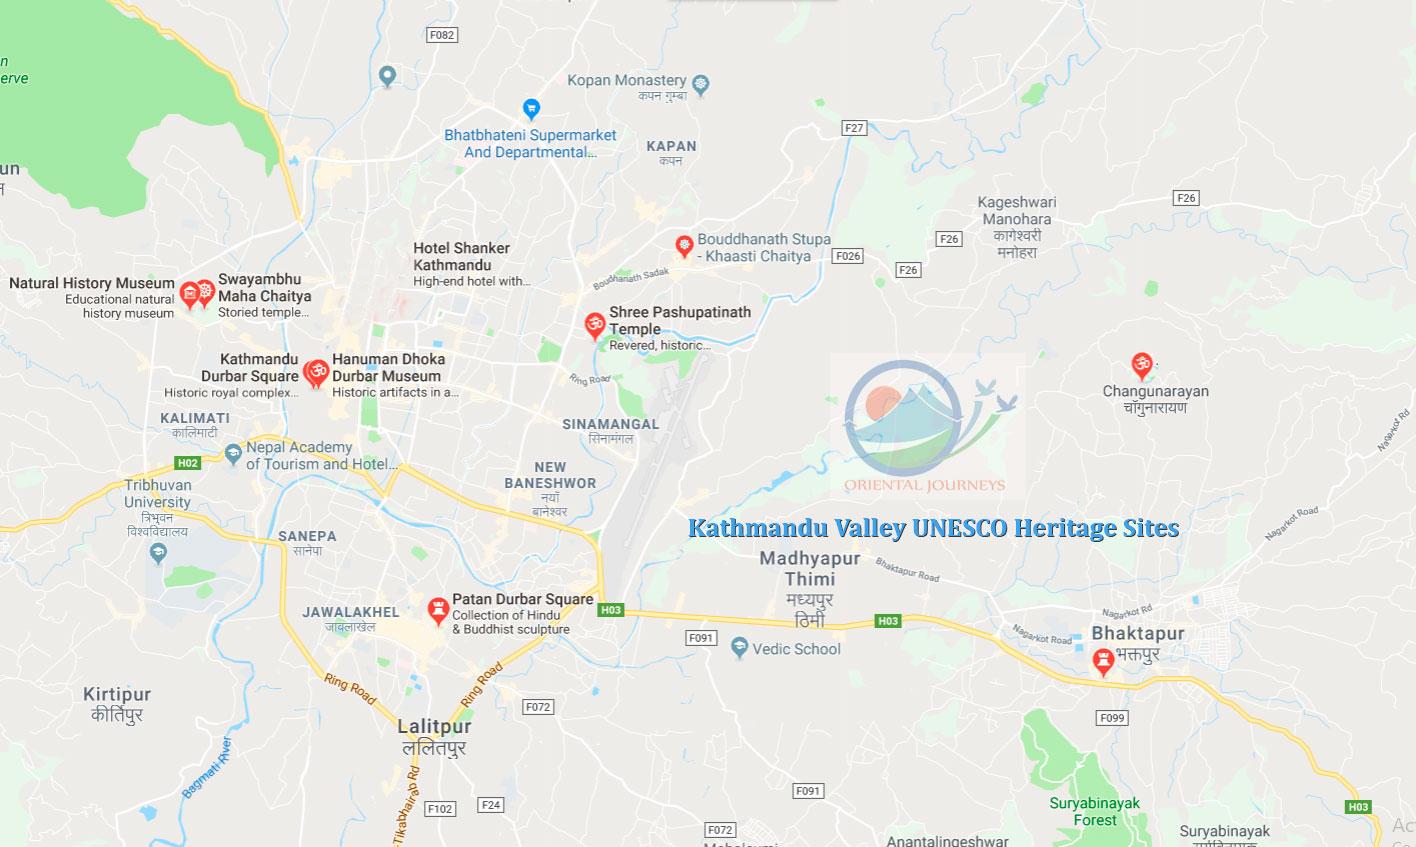 Kathmandu Valley Heritage Sites